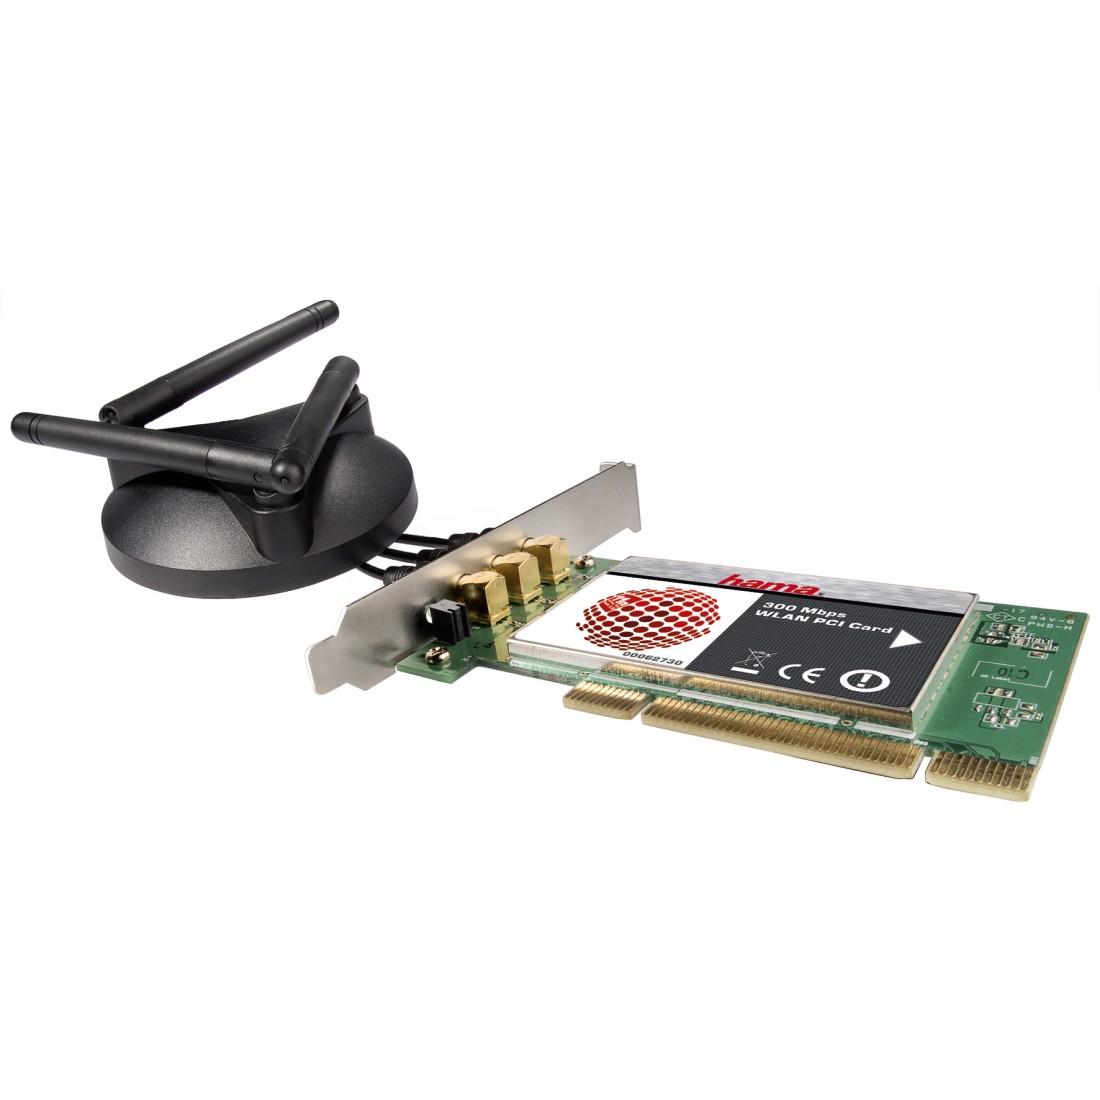 HAMA 300 Mbps WLAN PC Card Windows 7 64-BIT